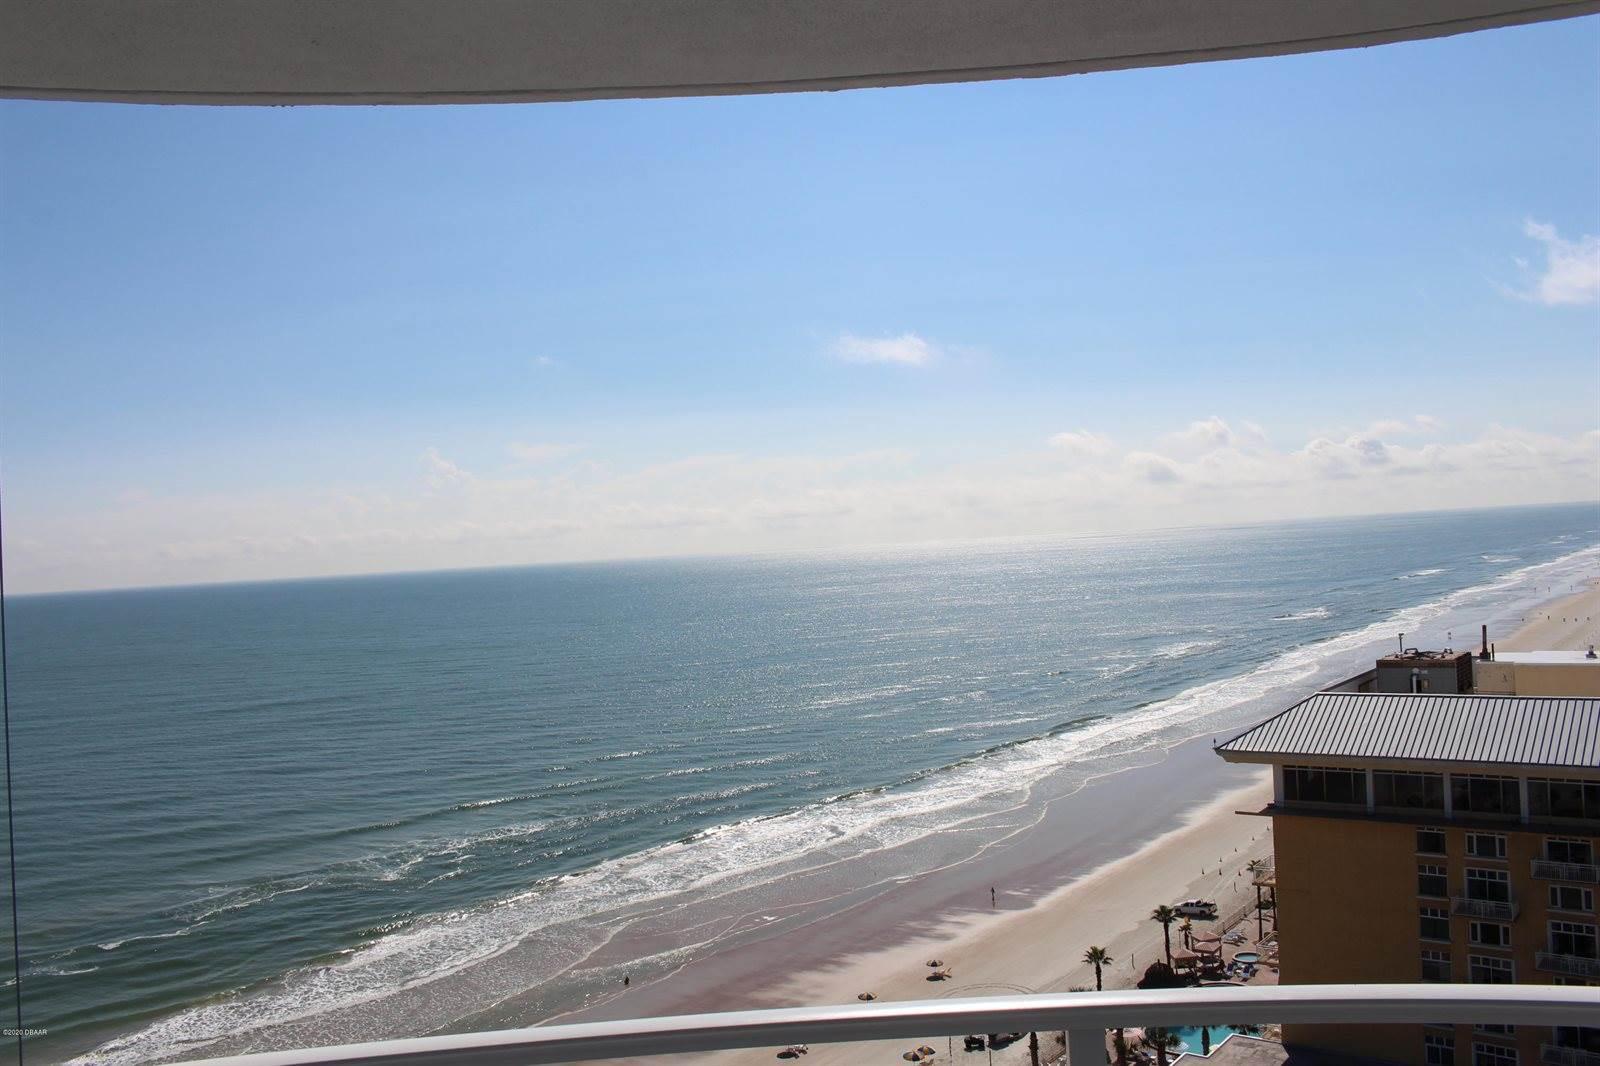 2625 S. Atlantic Avenue, #20 SE, Daytona Beach Shores, FL 32118